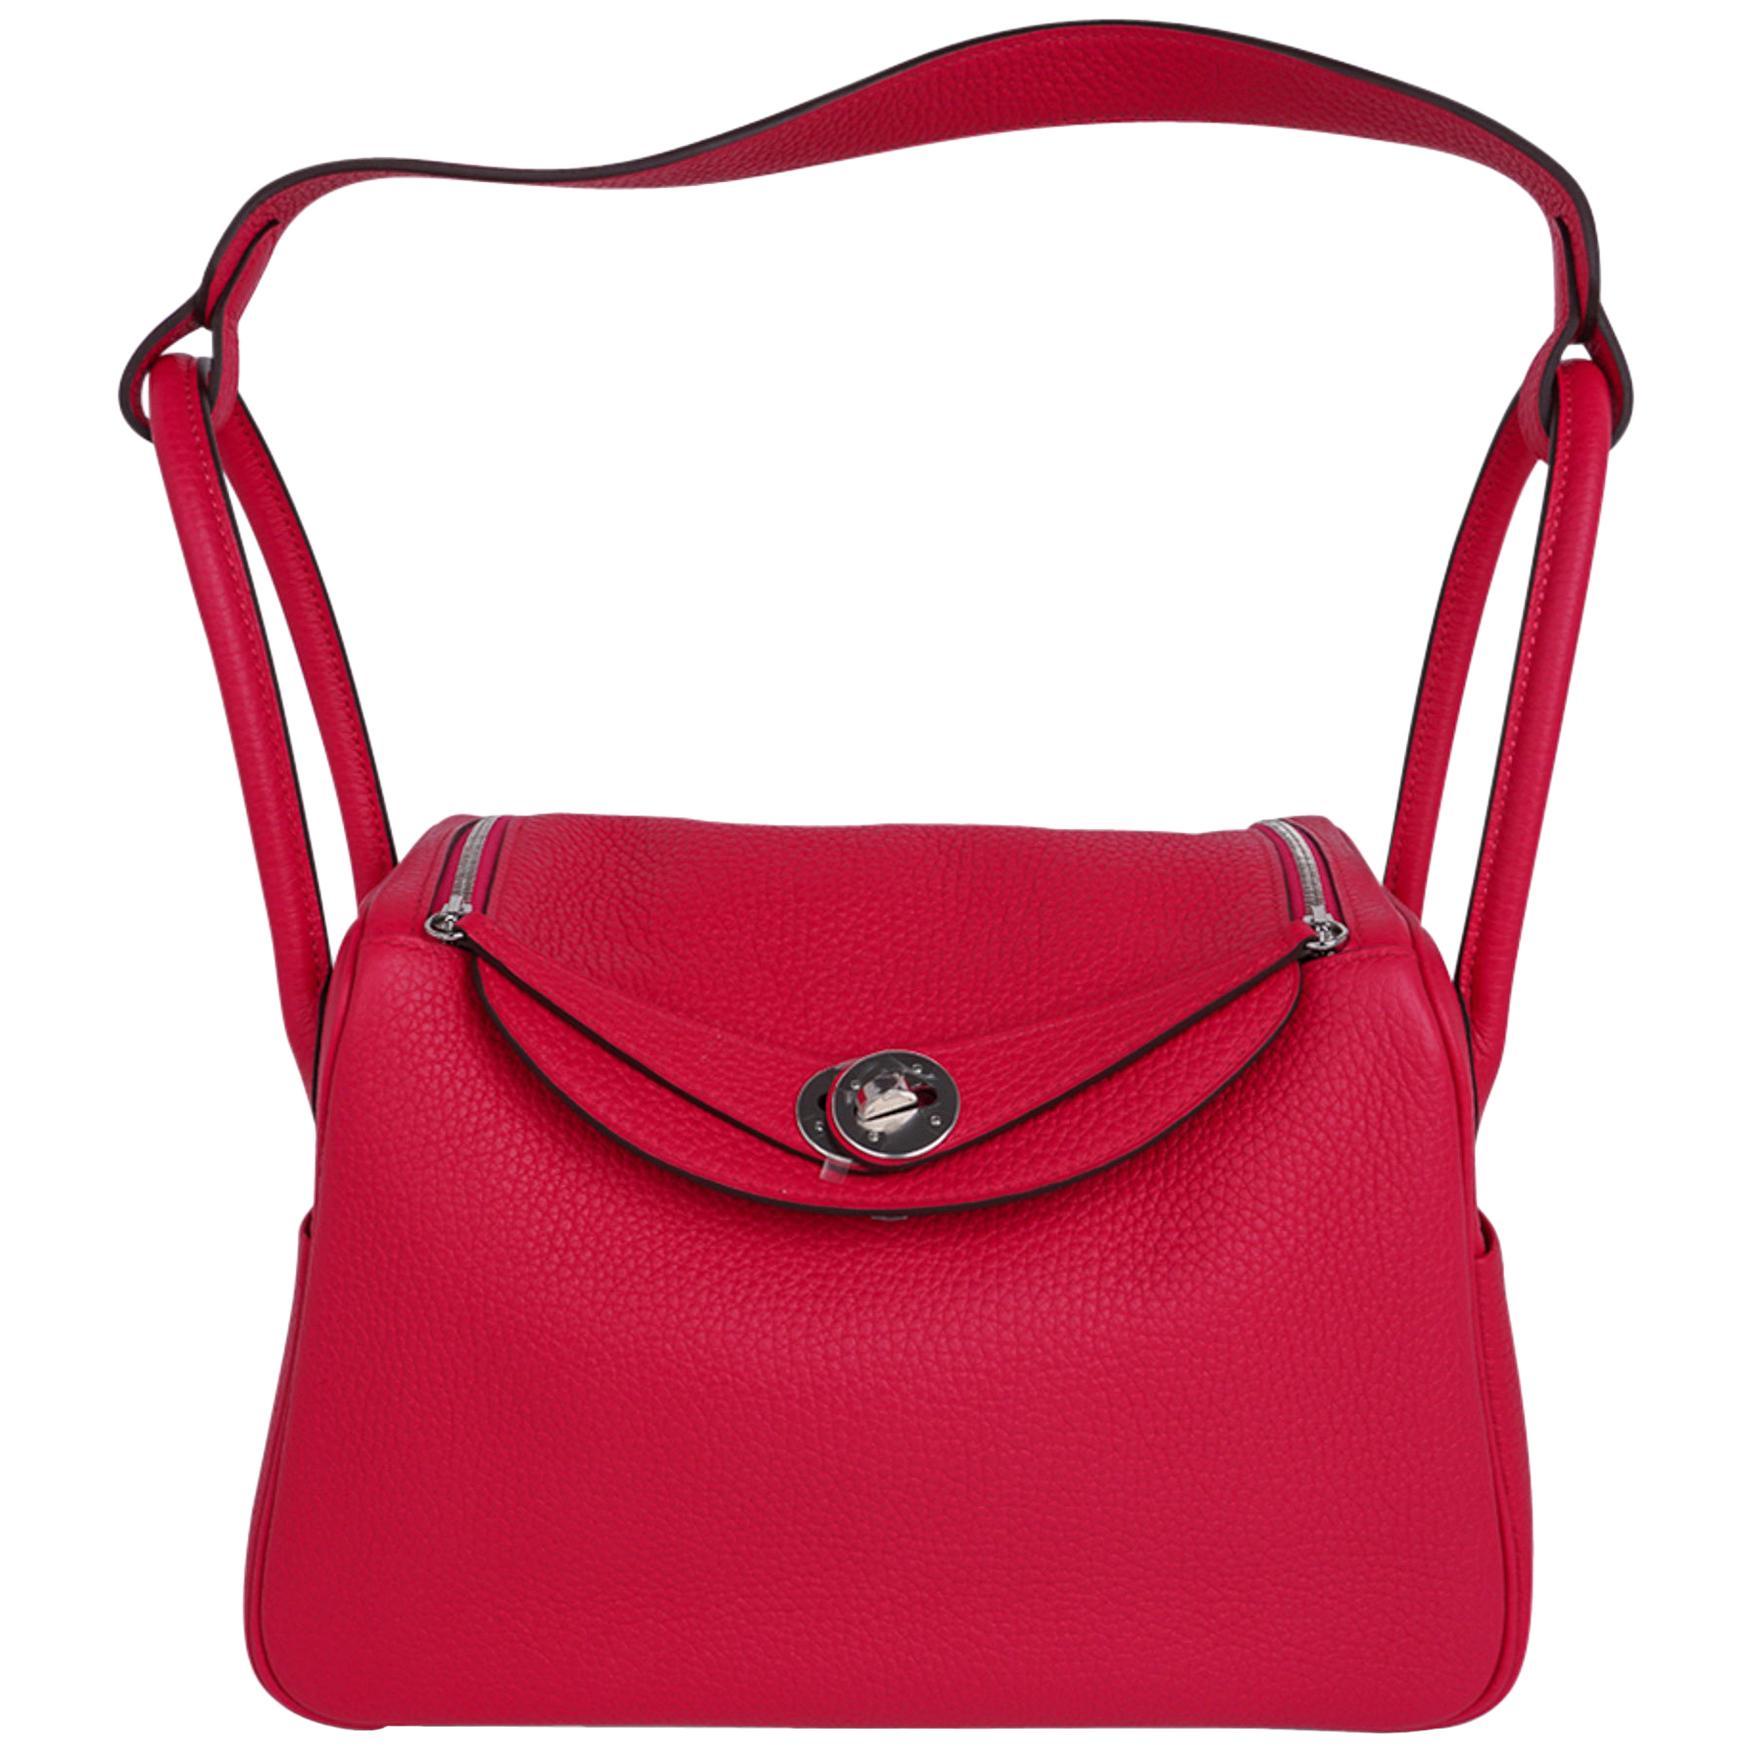 Hermes Lindy 26 Bag Rose Extreme Clemence Palladium Hardware